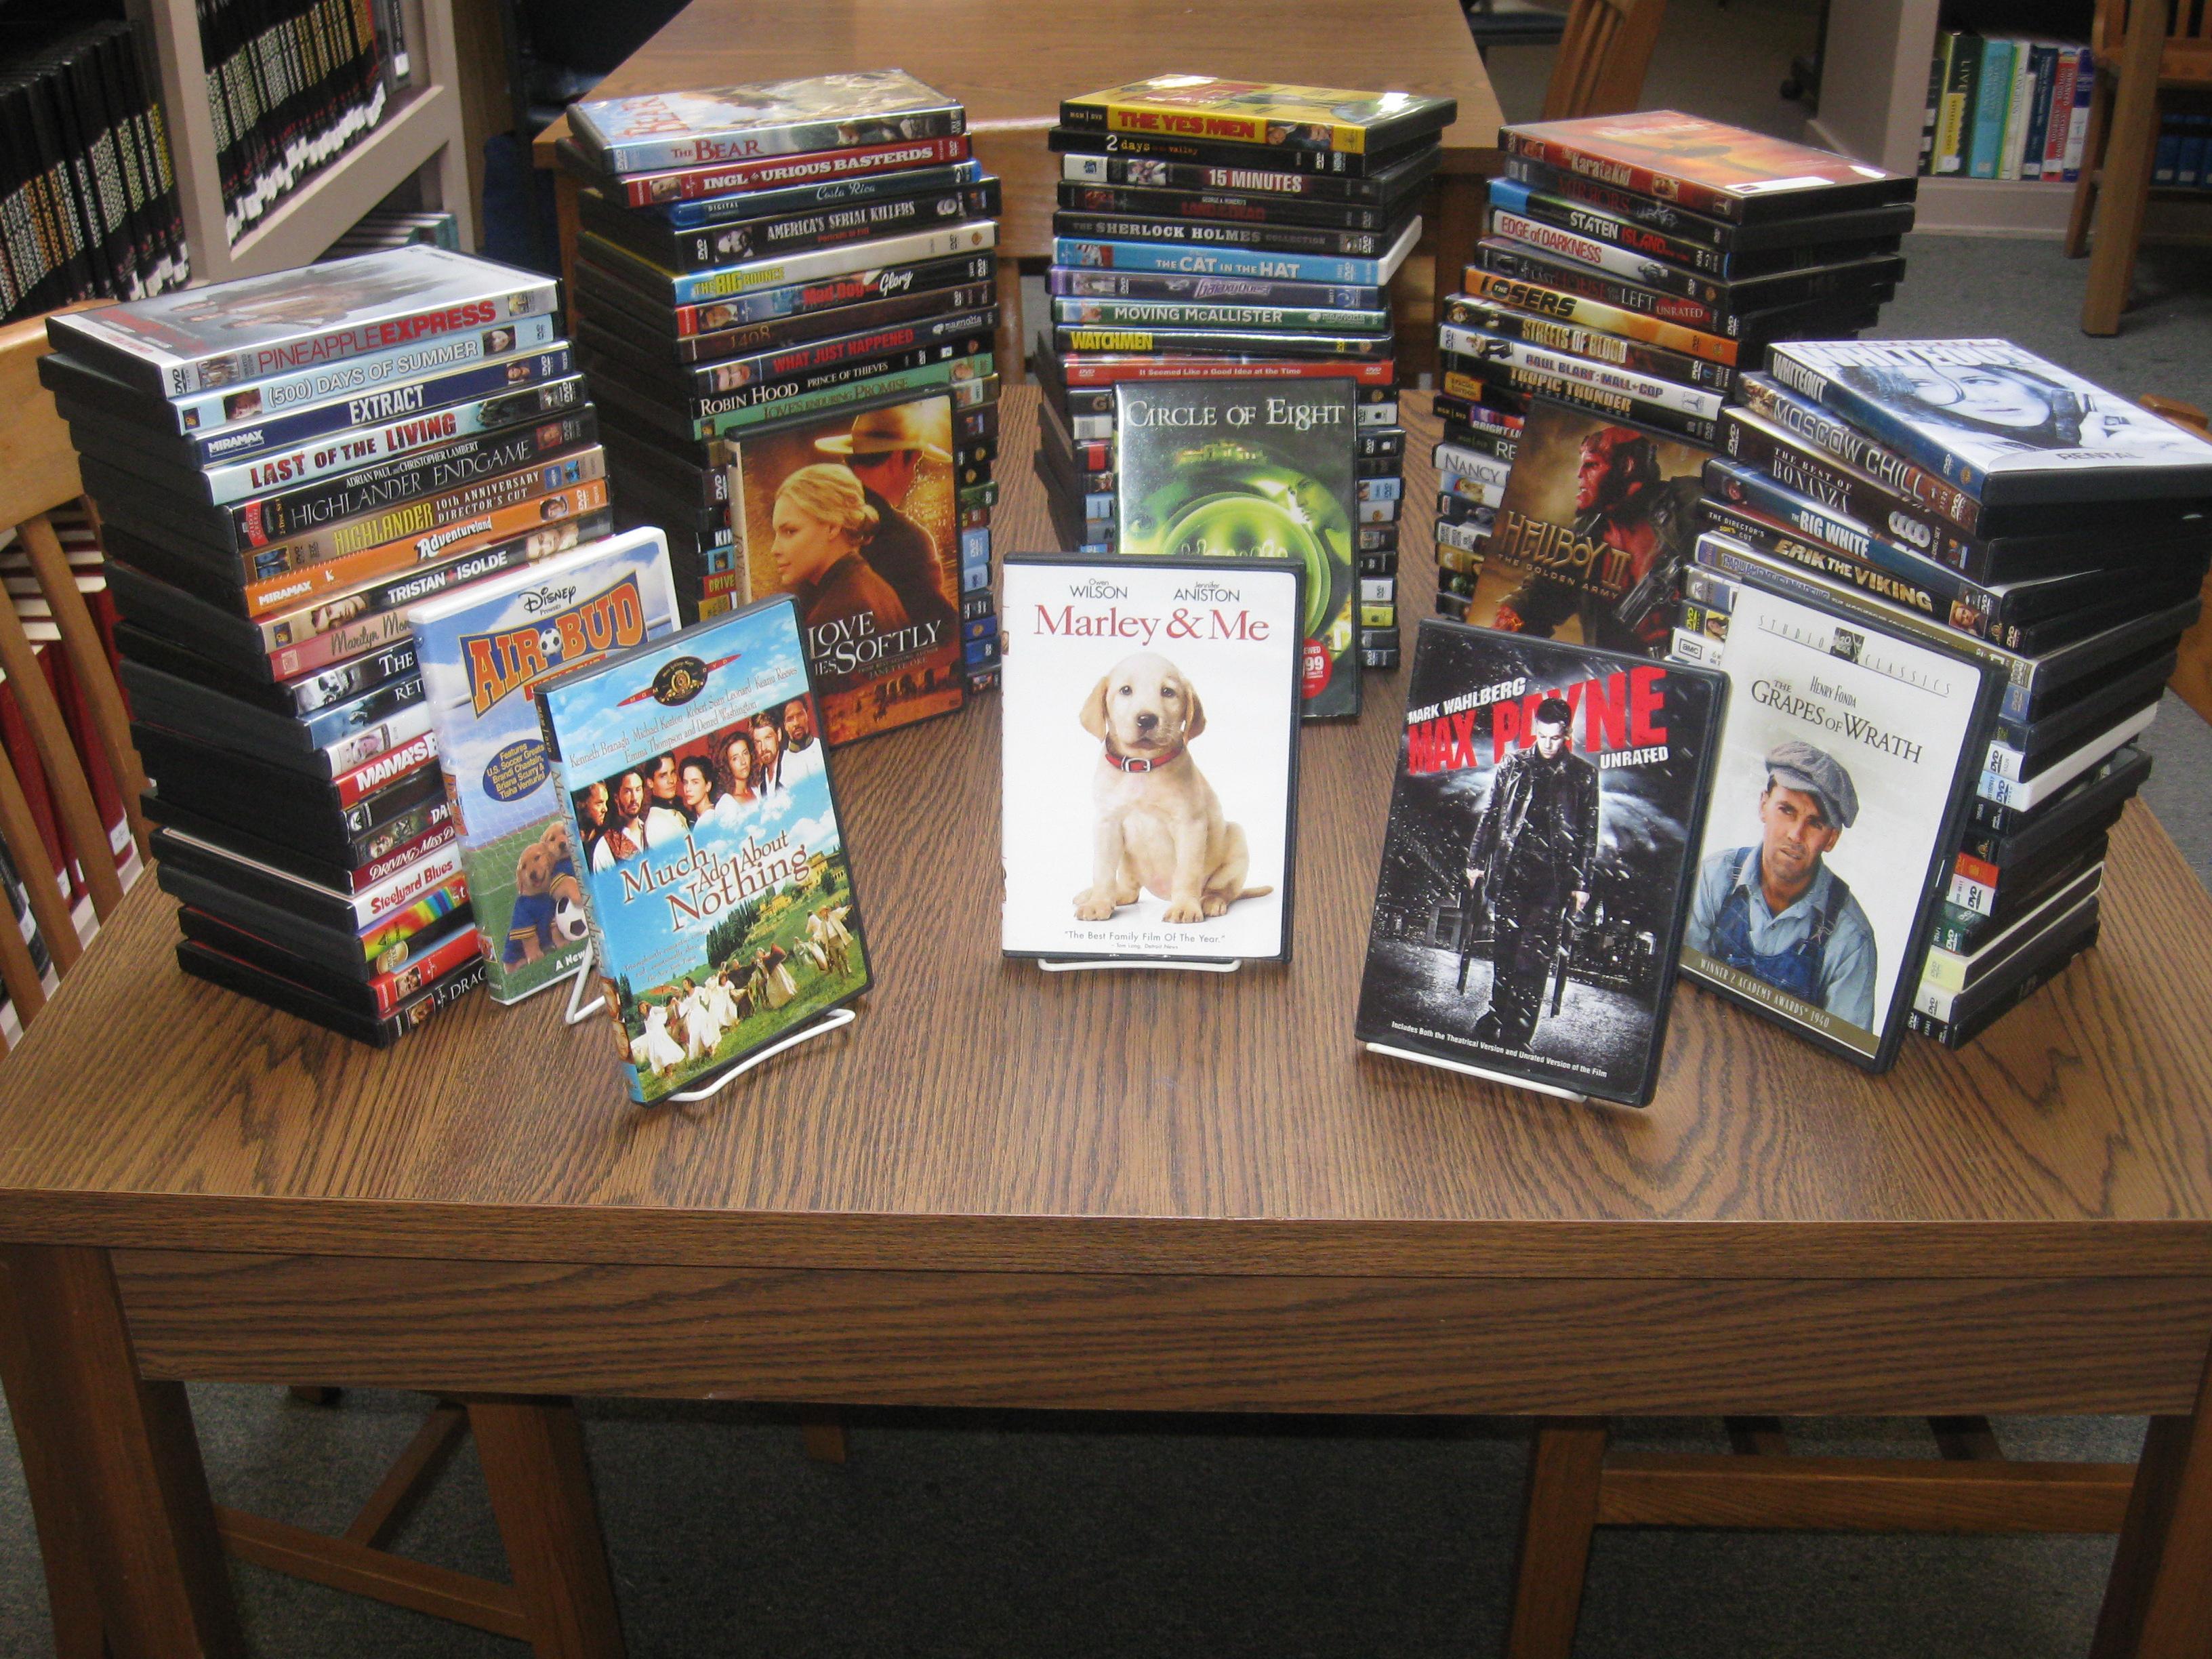 Donated Movies